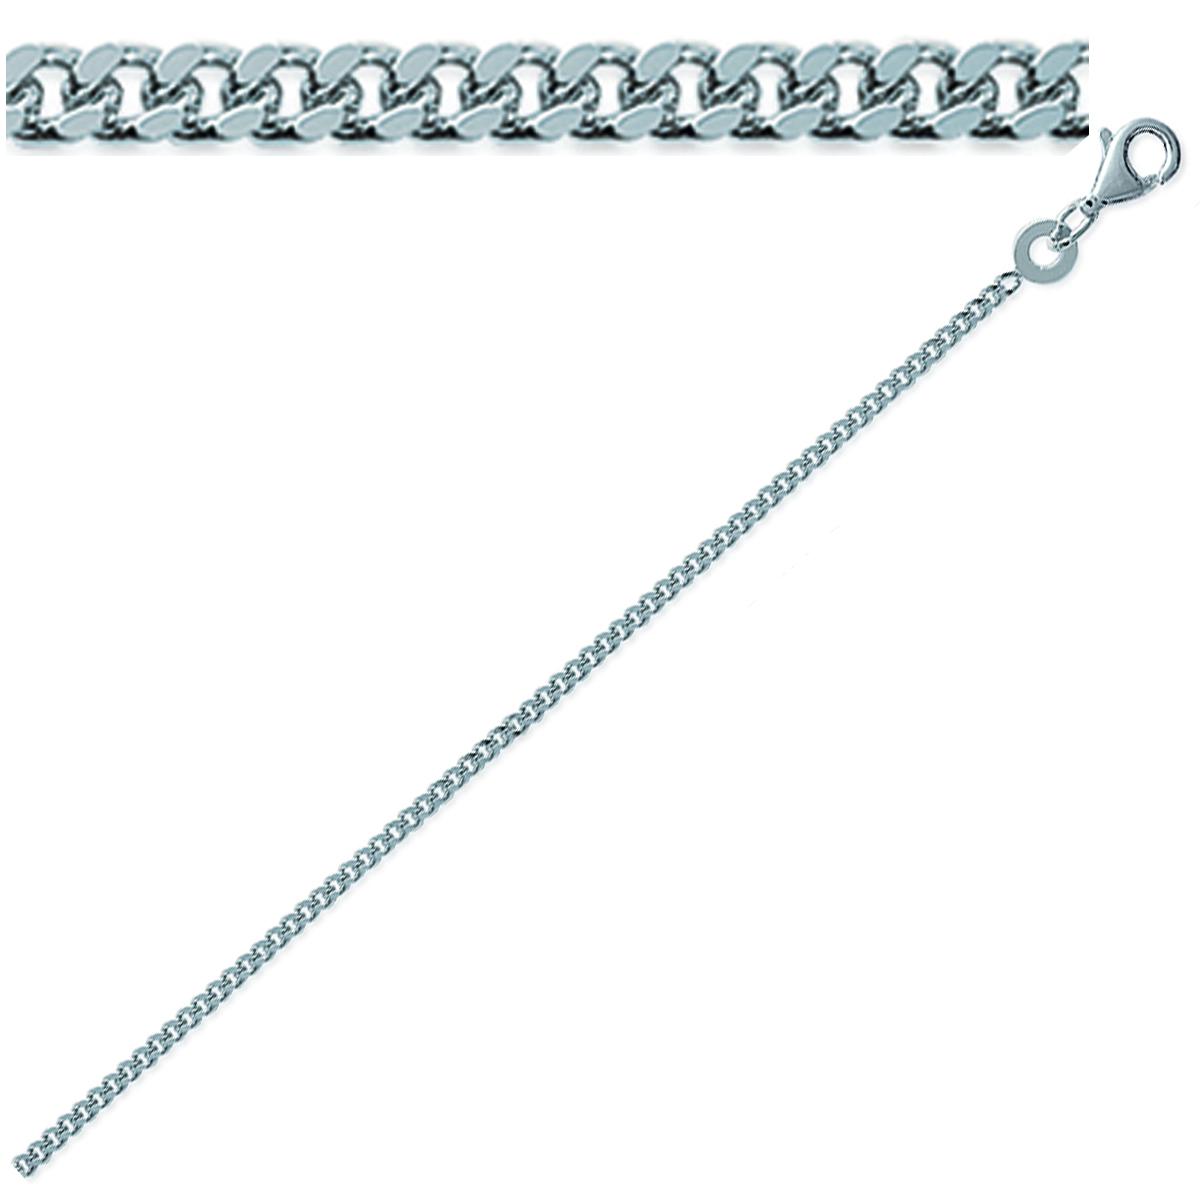 Chaine Argent \'Maille Gourmette\' 50 cm 16 mm - [C7463]